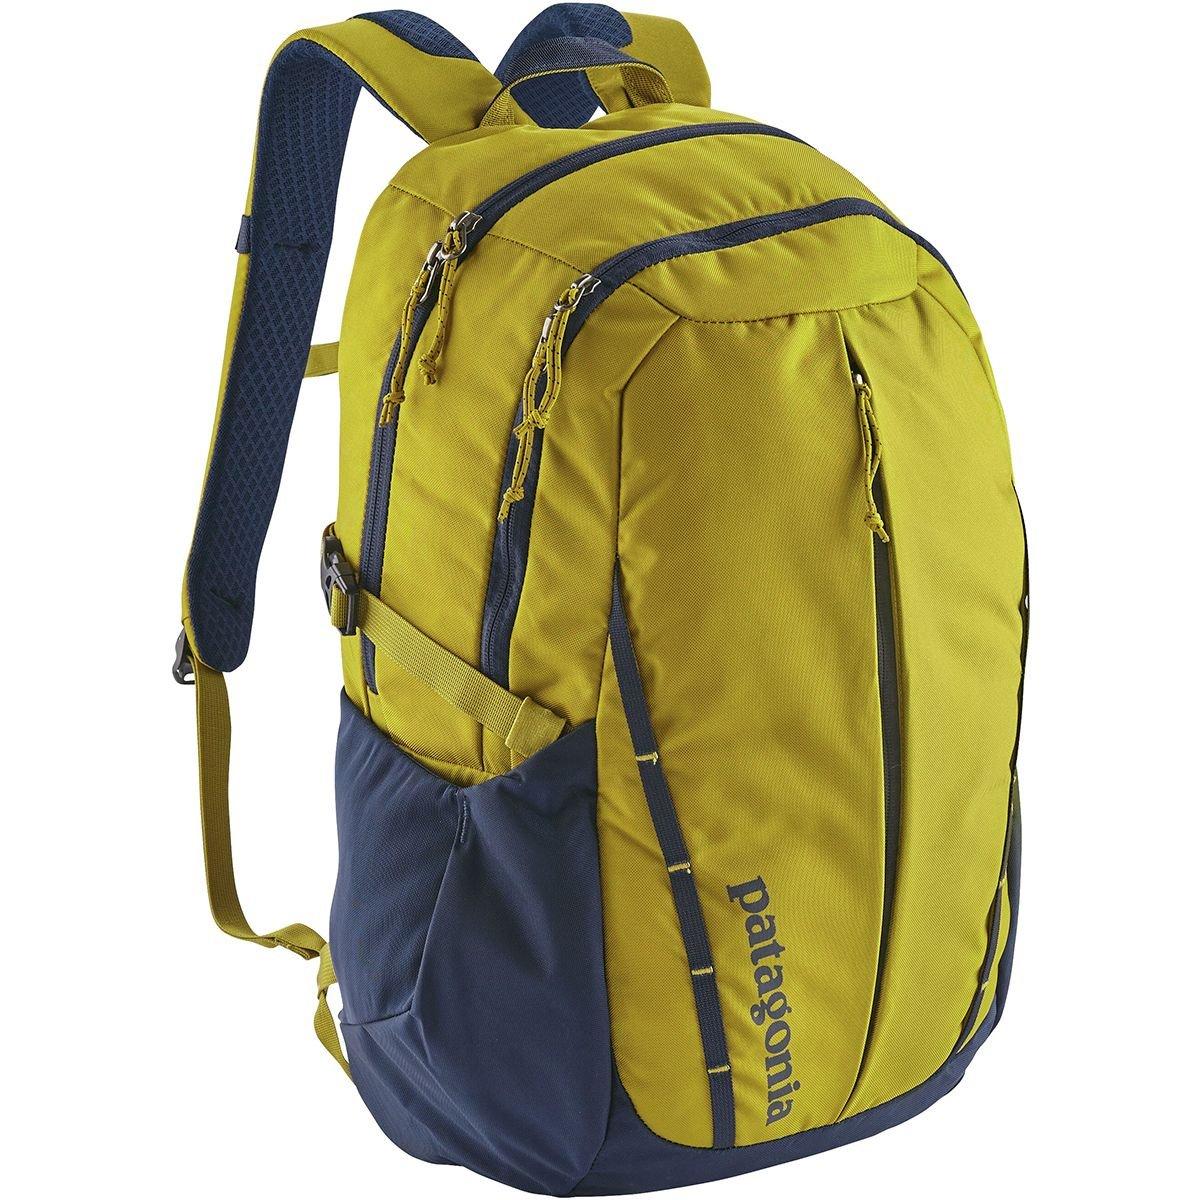 Outdoor Military Tactical Backpack Camping Hiking Trekking Shoulder Bag 13265